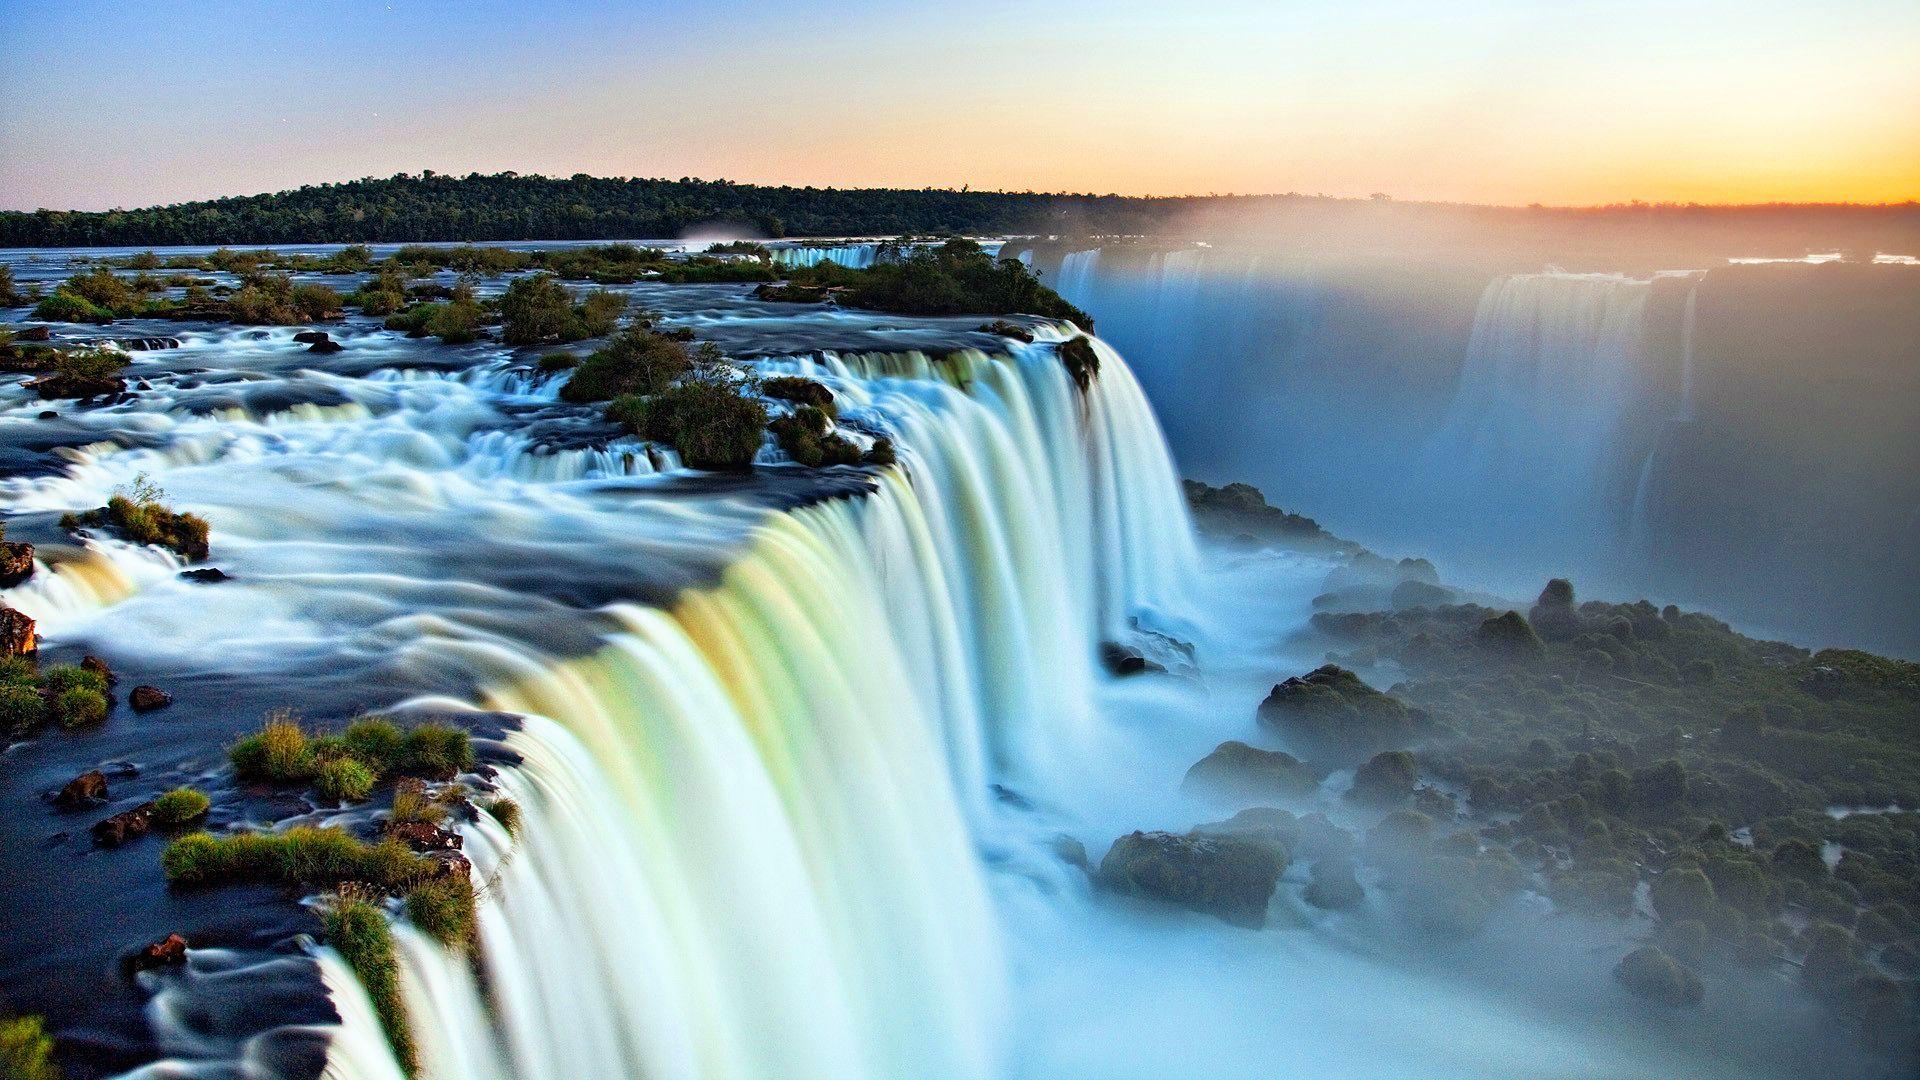 Cheap Hotels Near Niagara Falls Canada Niagara Falls Canada Pinterest Niagara Falls Cheap